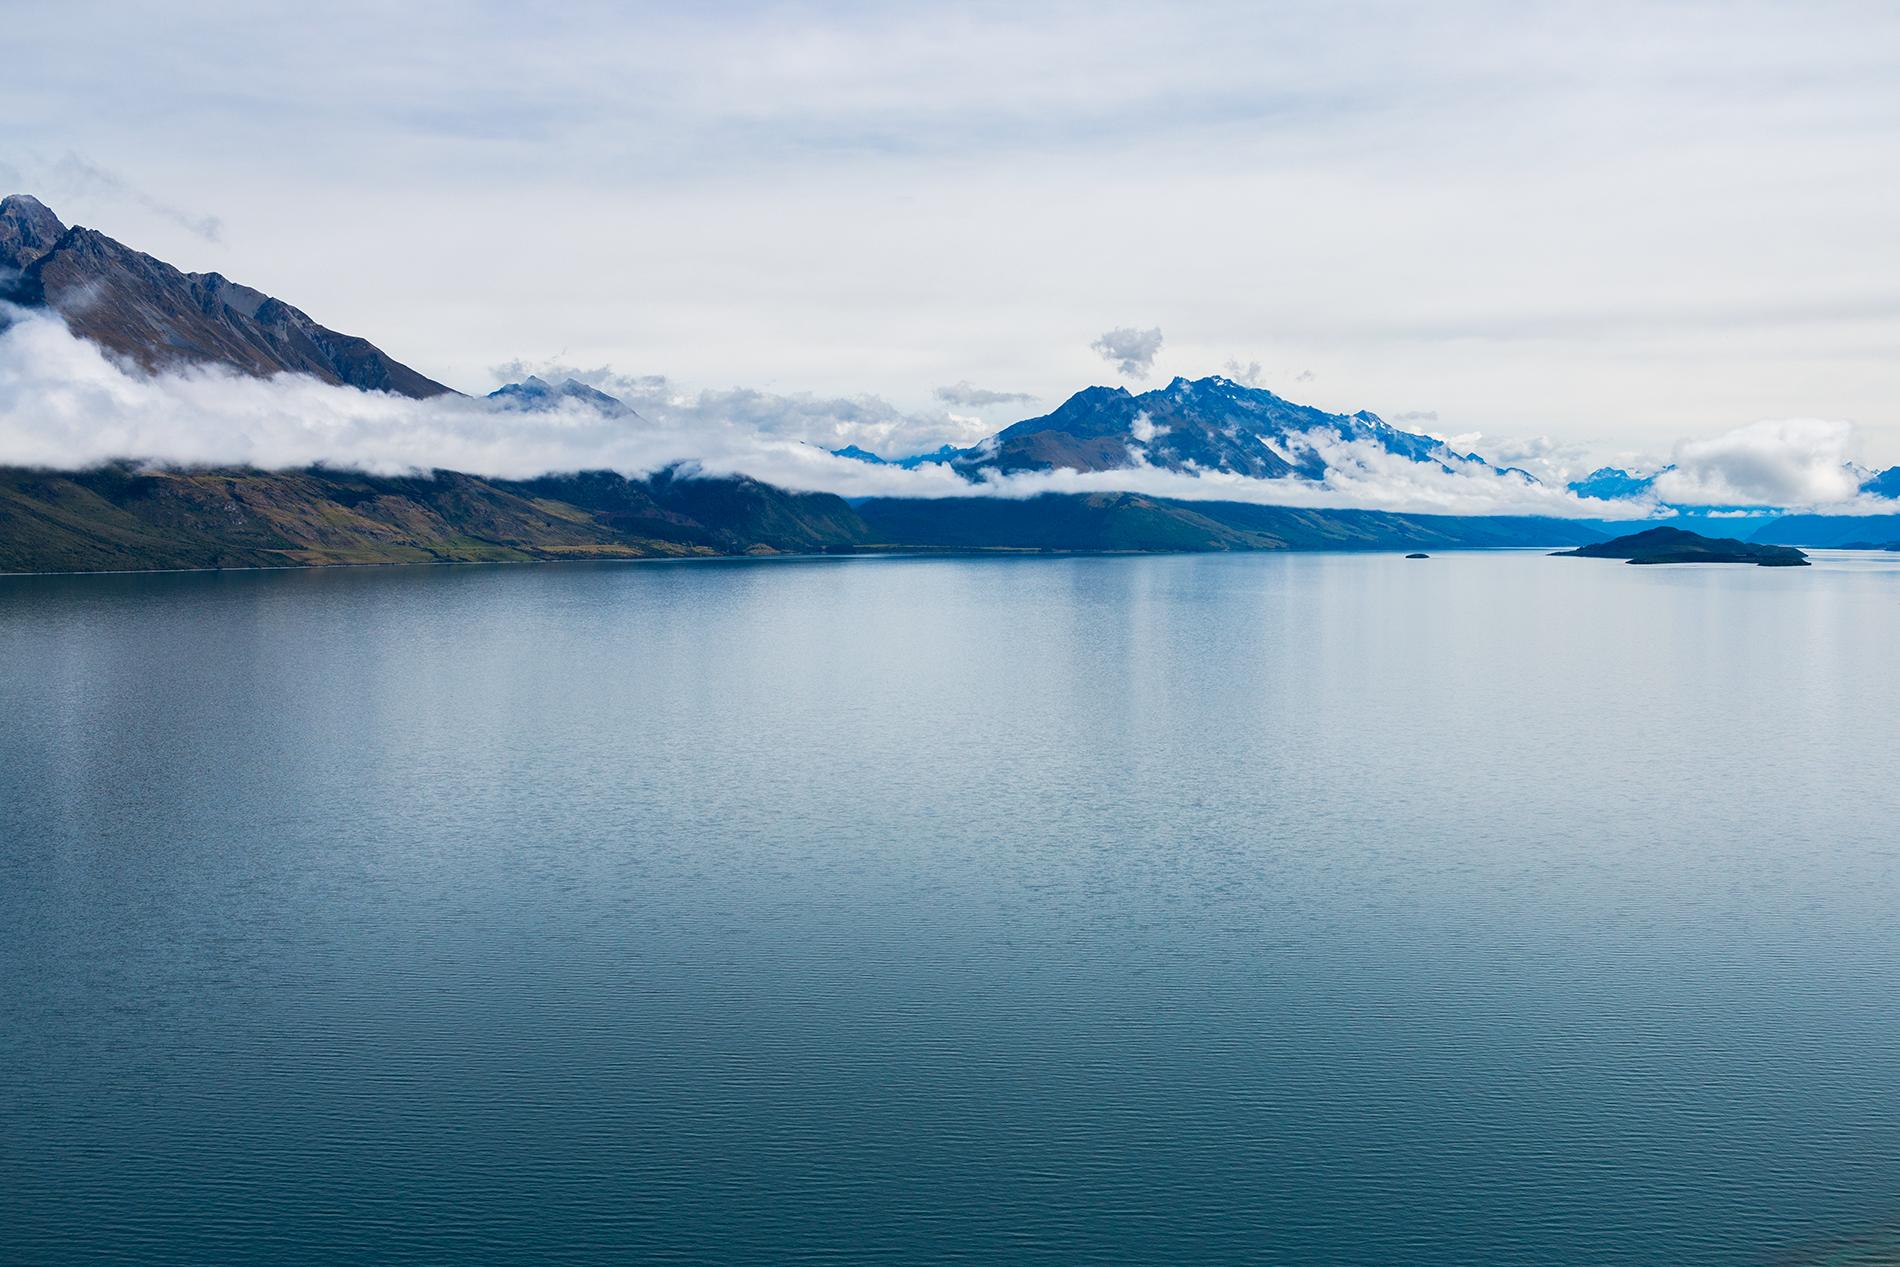 Lake_Wakatipu_New_Zealand_1.png